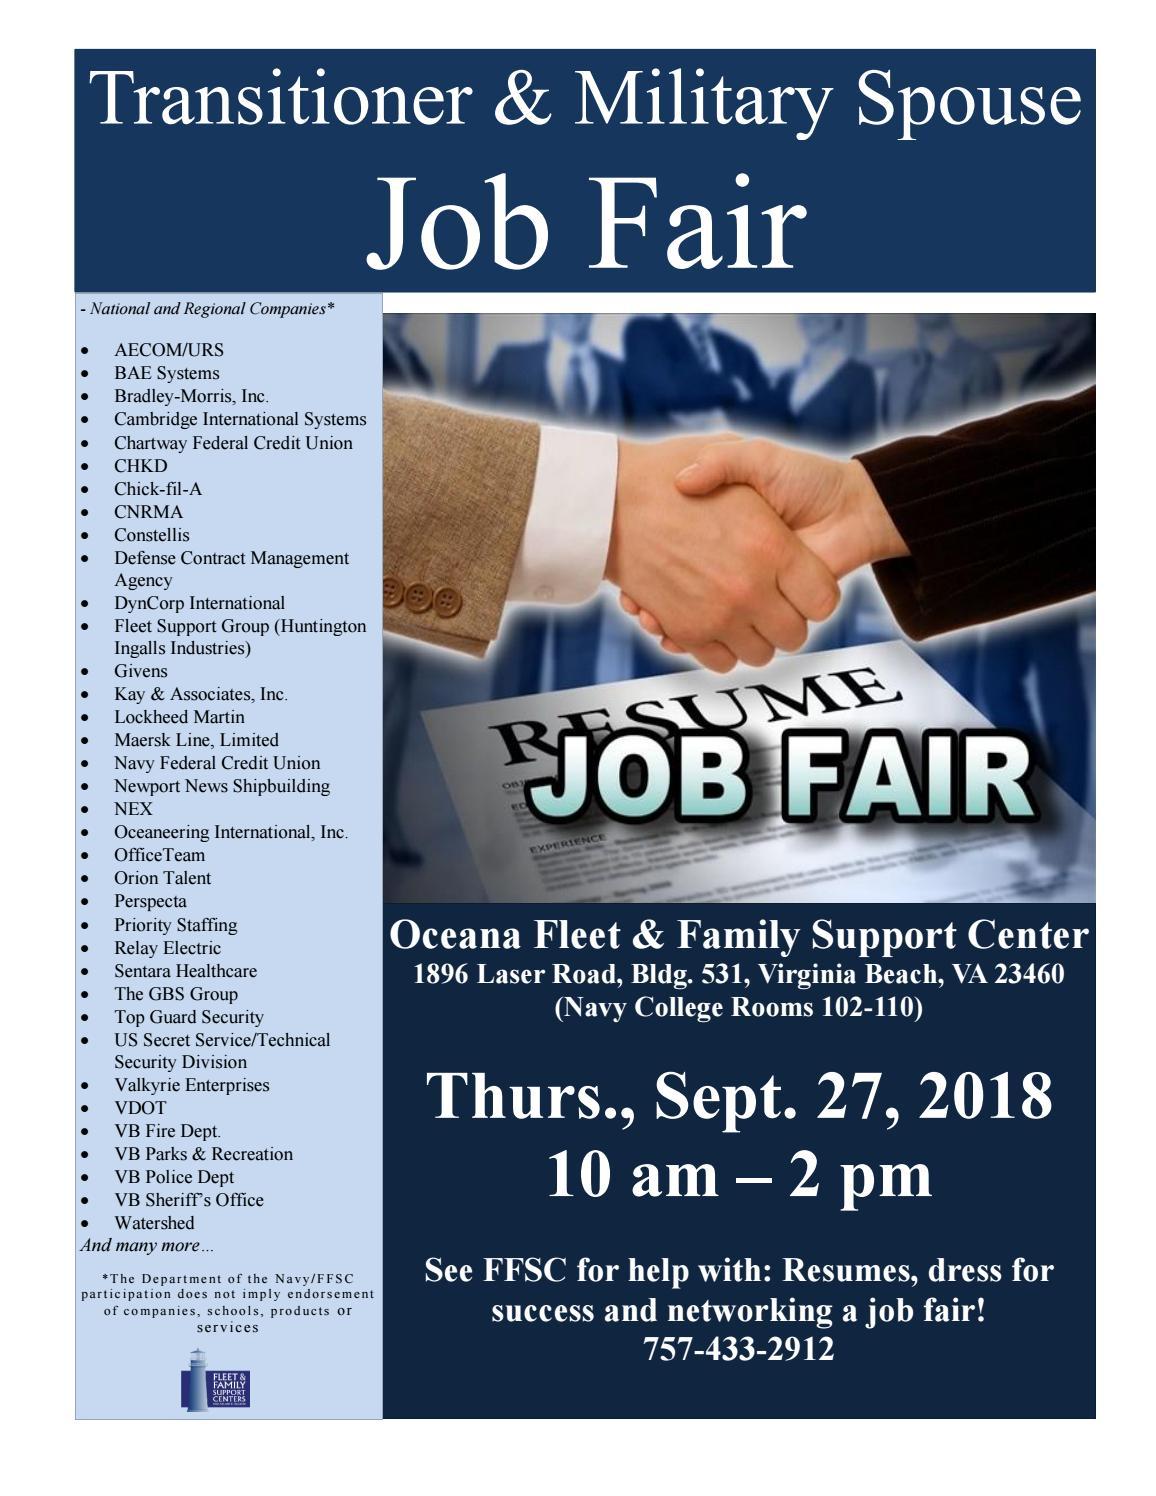 Ffsc Oceana Job Fair 092718 By Jen Allison Issuu Relay Electric Virginia Beach